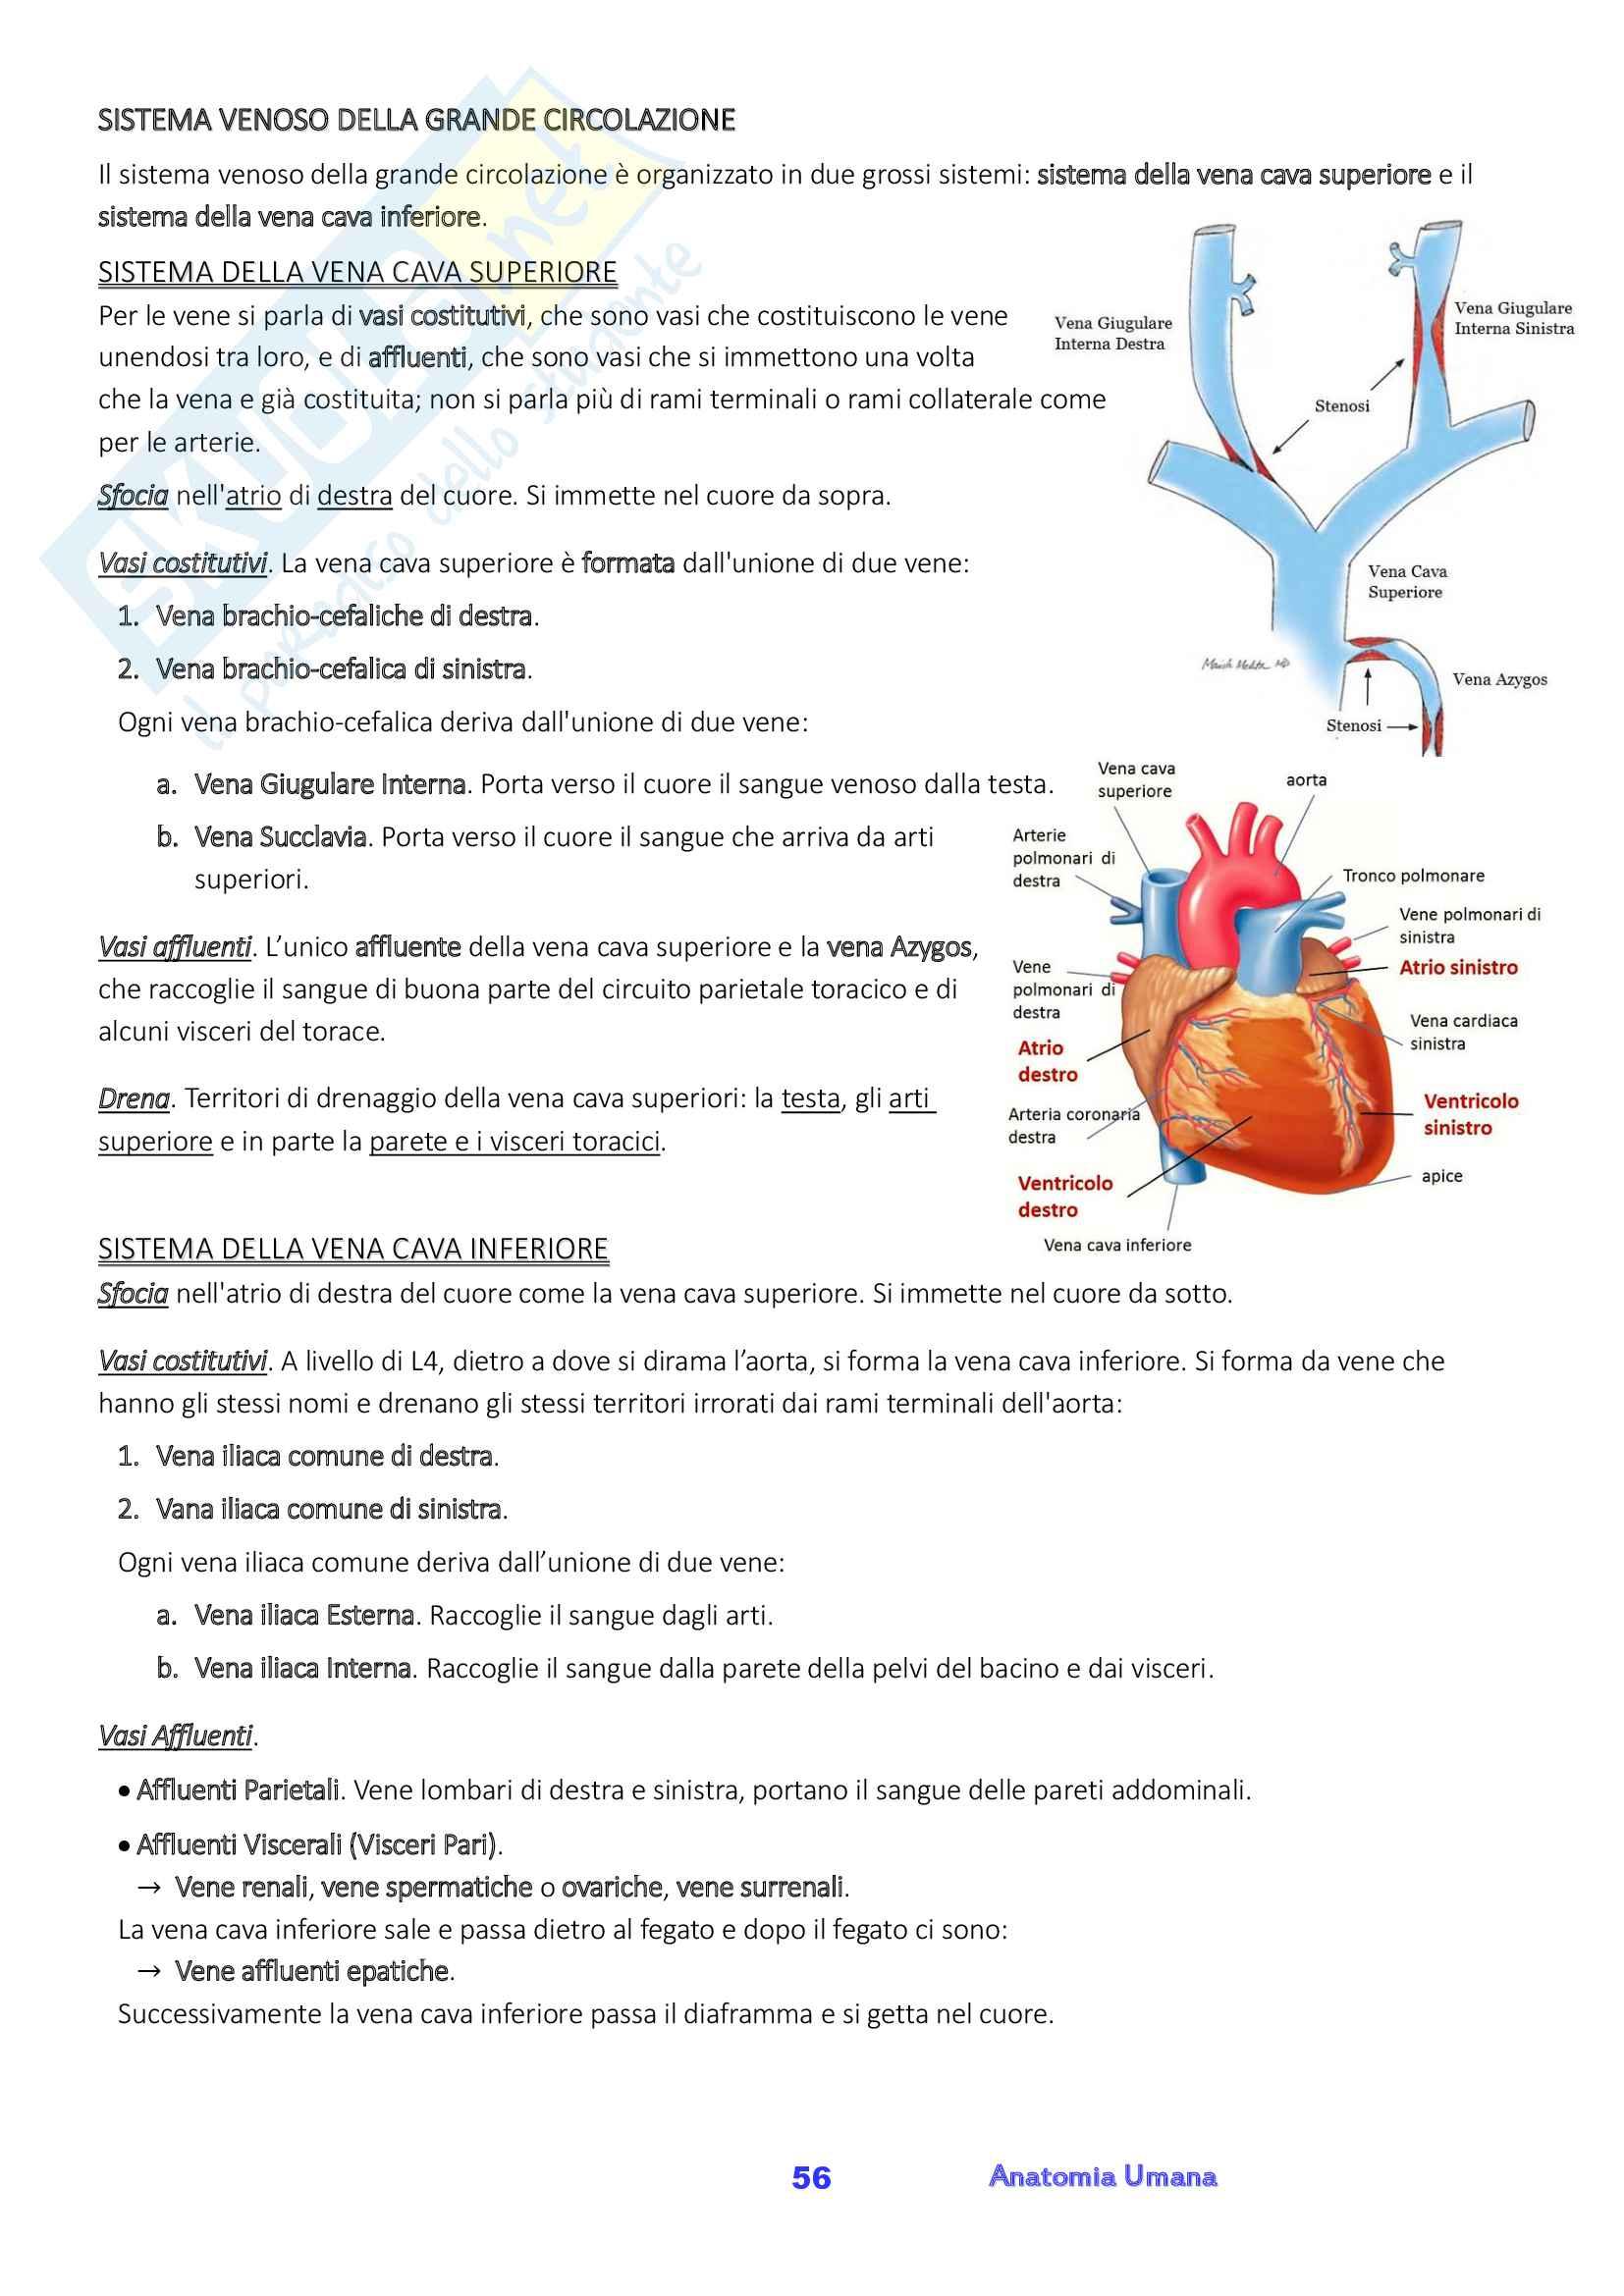 Anatomia umana, Appunti, Prof.ssa Ferretti Pag. 56